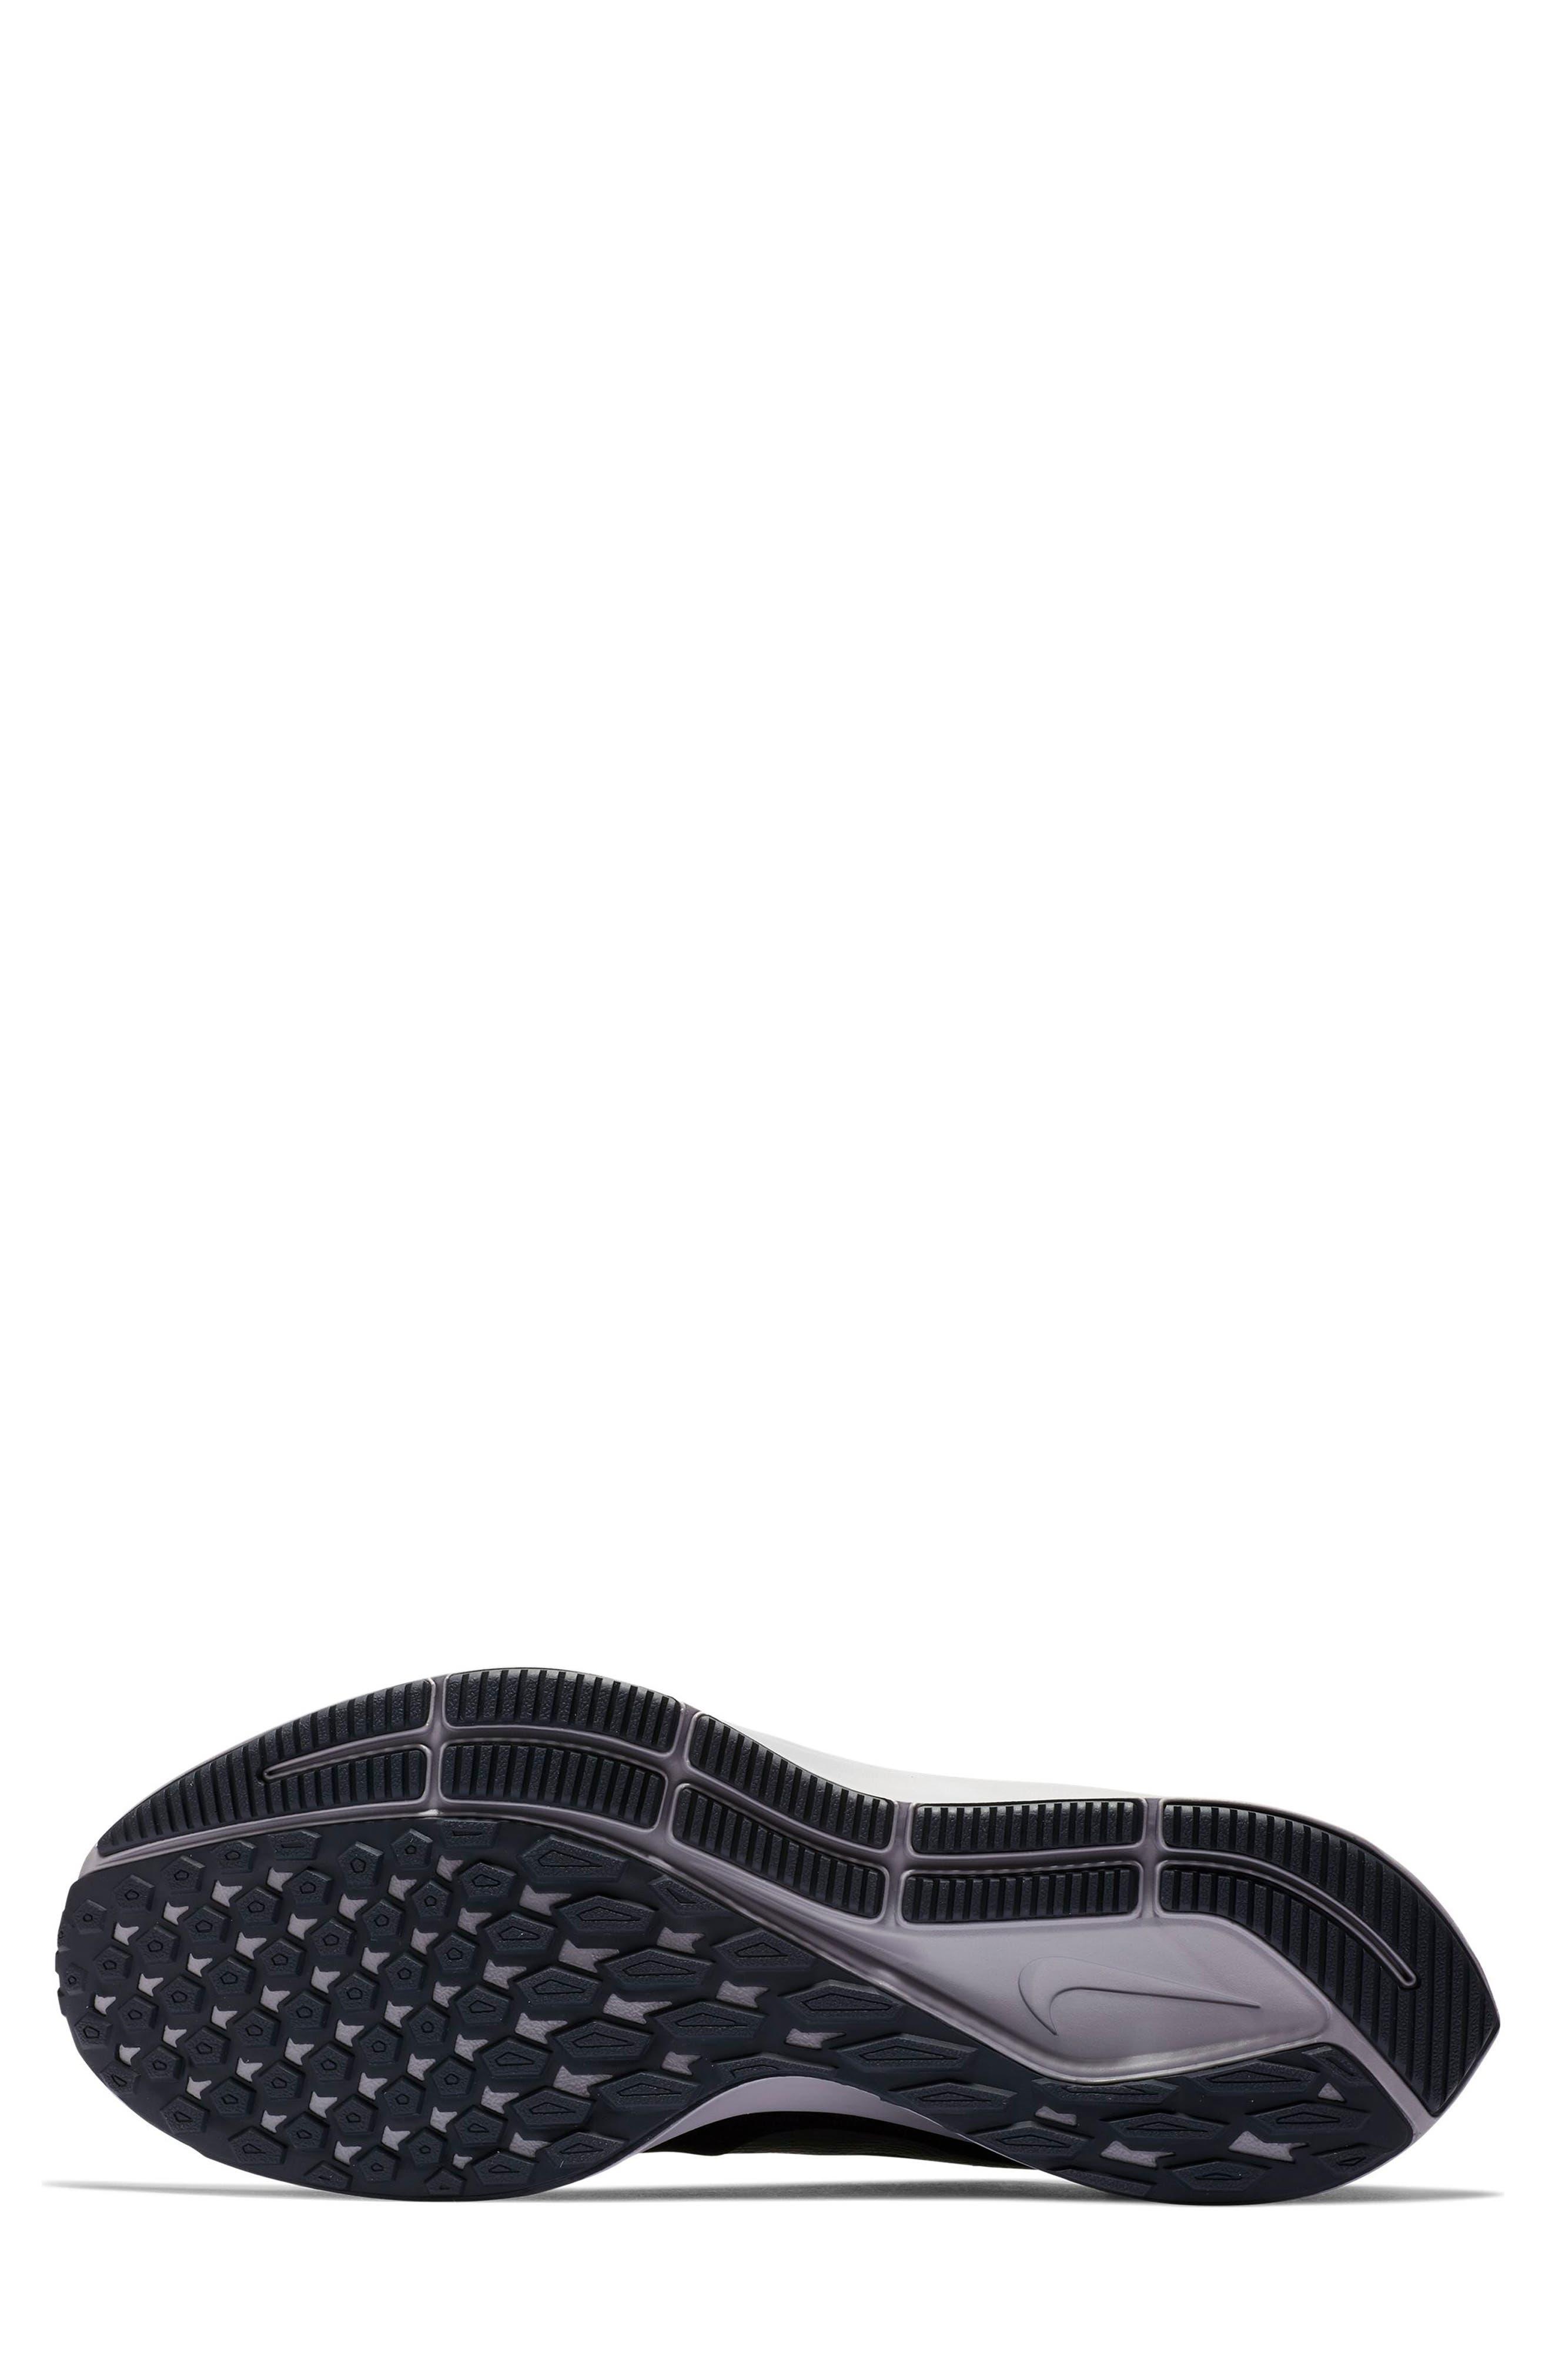 Air Zoom Pegasus 35 Running Shoe,                             Alternate thumbnail 4, color,                             BLACK/ PEWTER/ MOSS